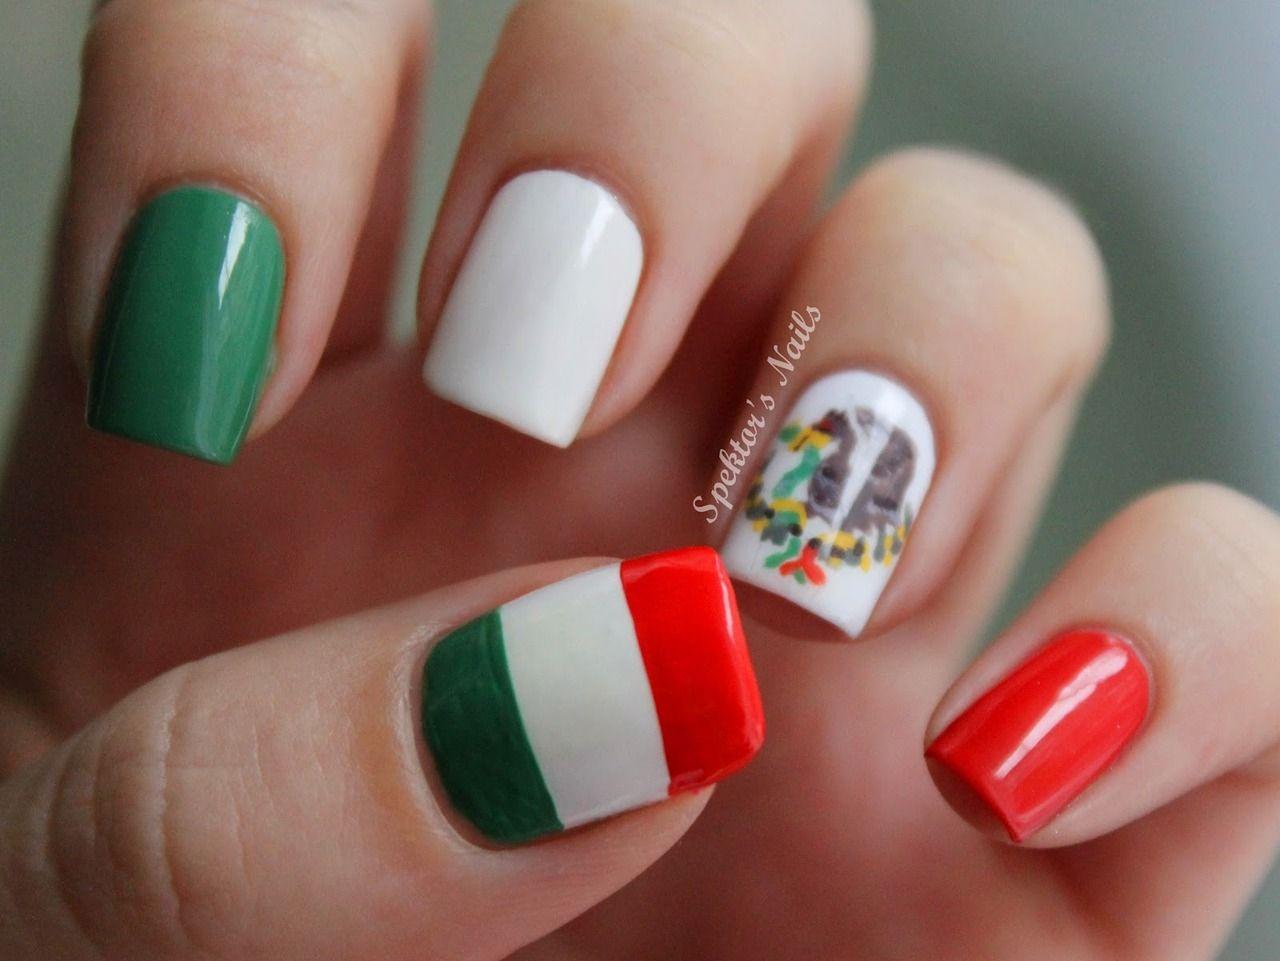 unas decorada bandera de mexico (3) | nail art favs | Pinterest ...